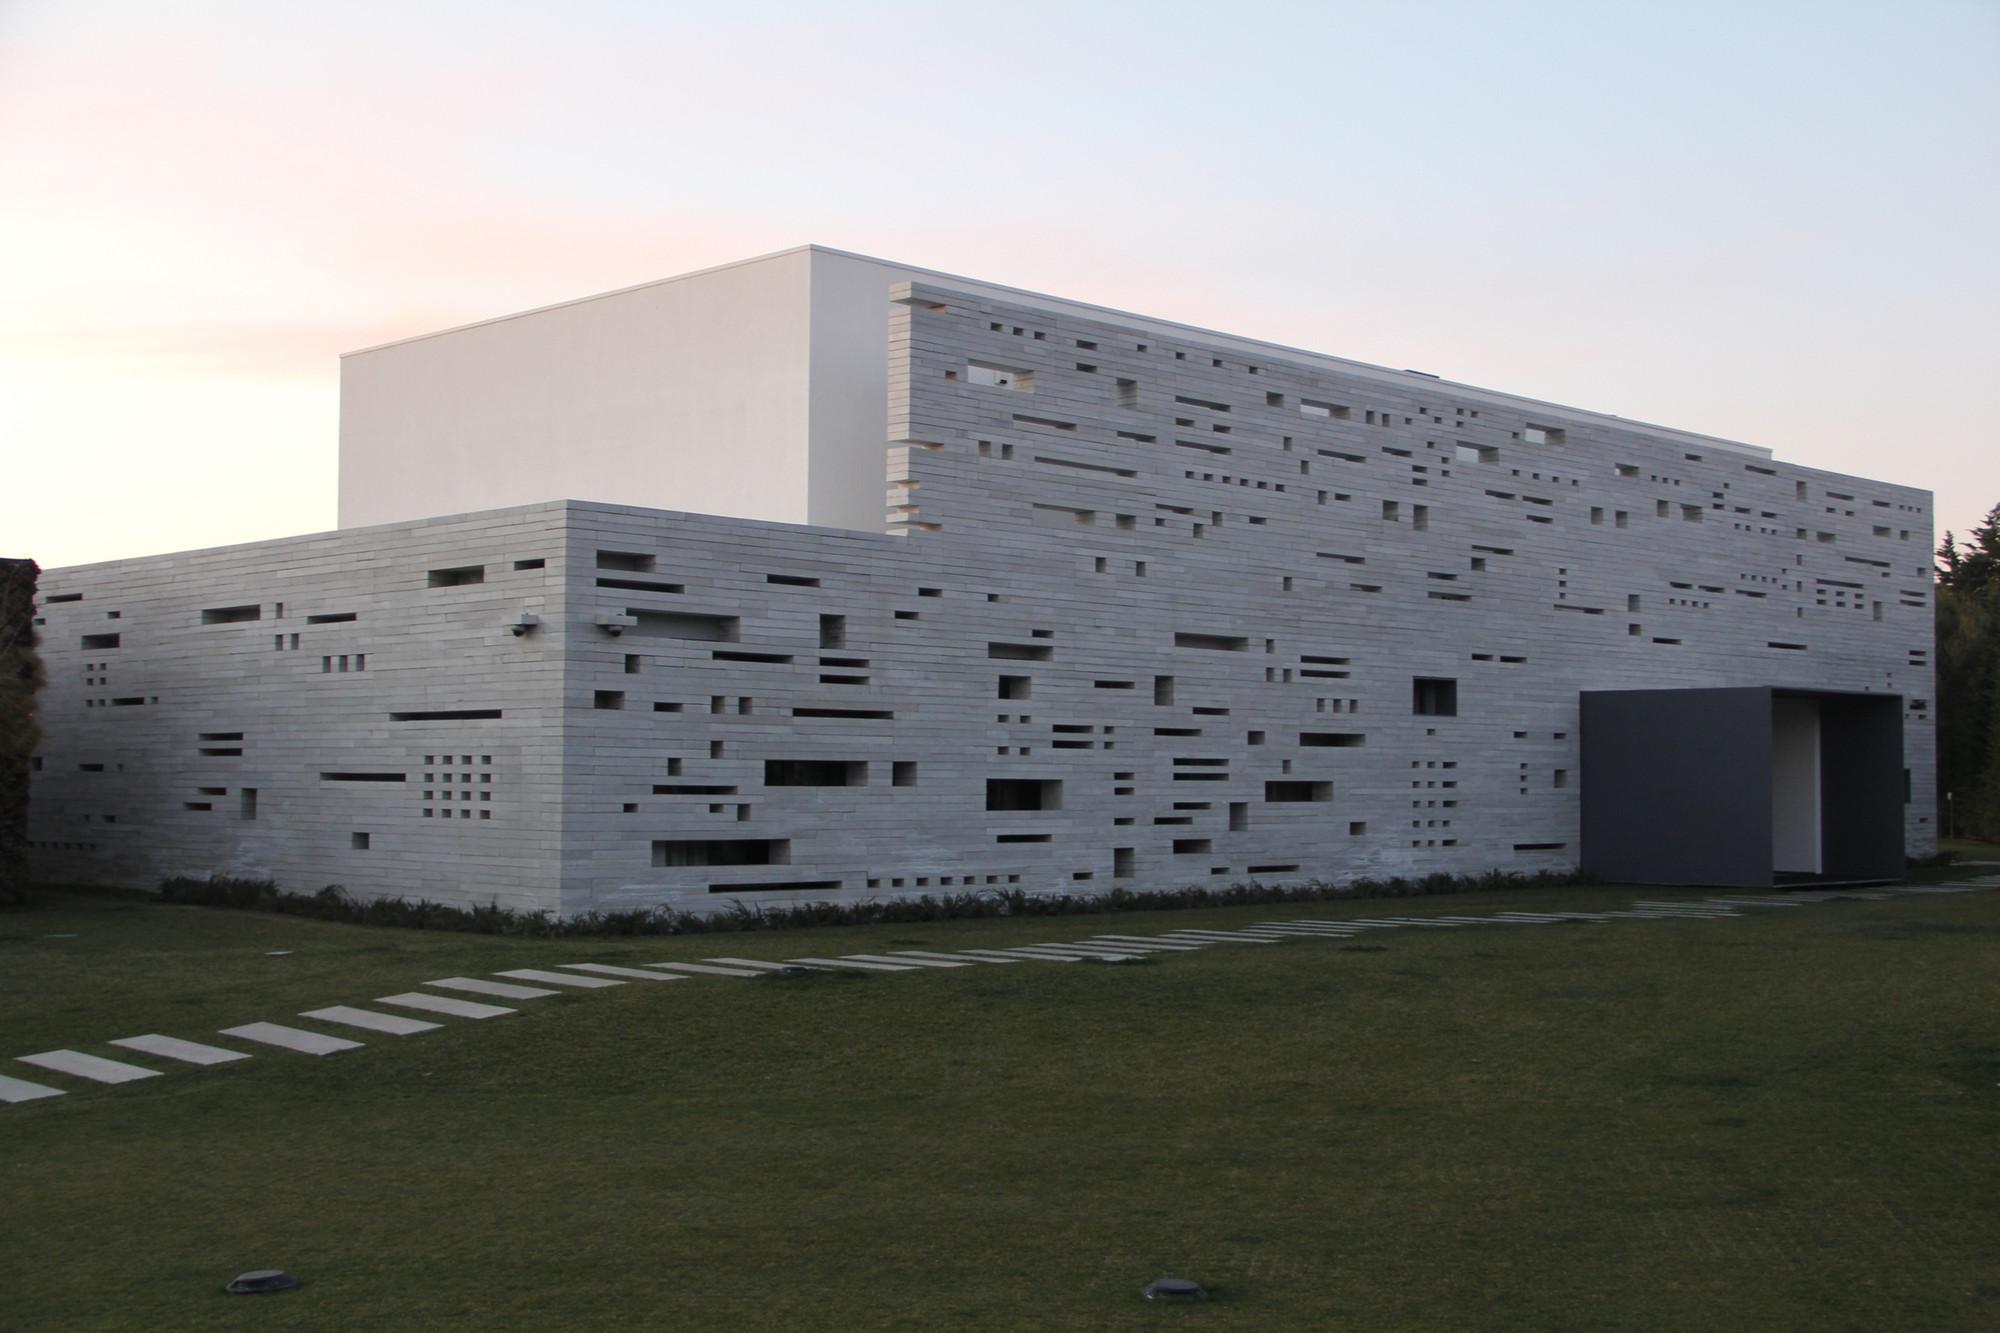 The Lifting House / Guedes Cruz Arquitectos, Courtesy of Guedes Cruz Arquitectos